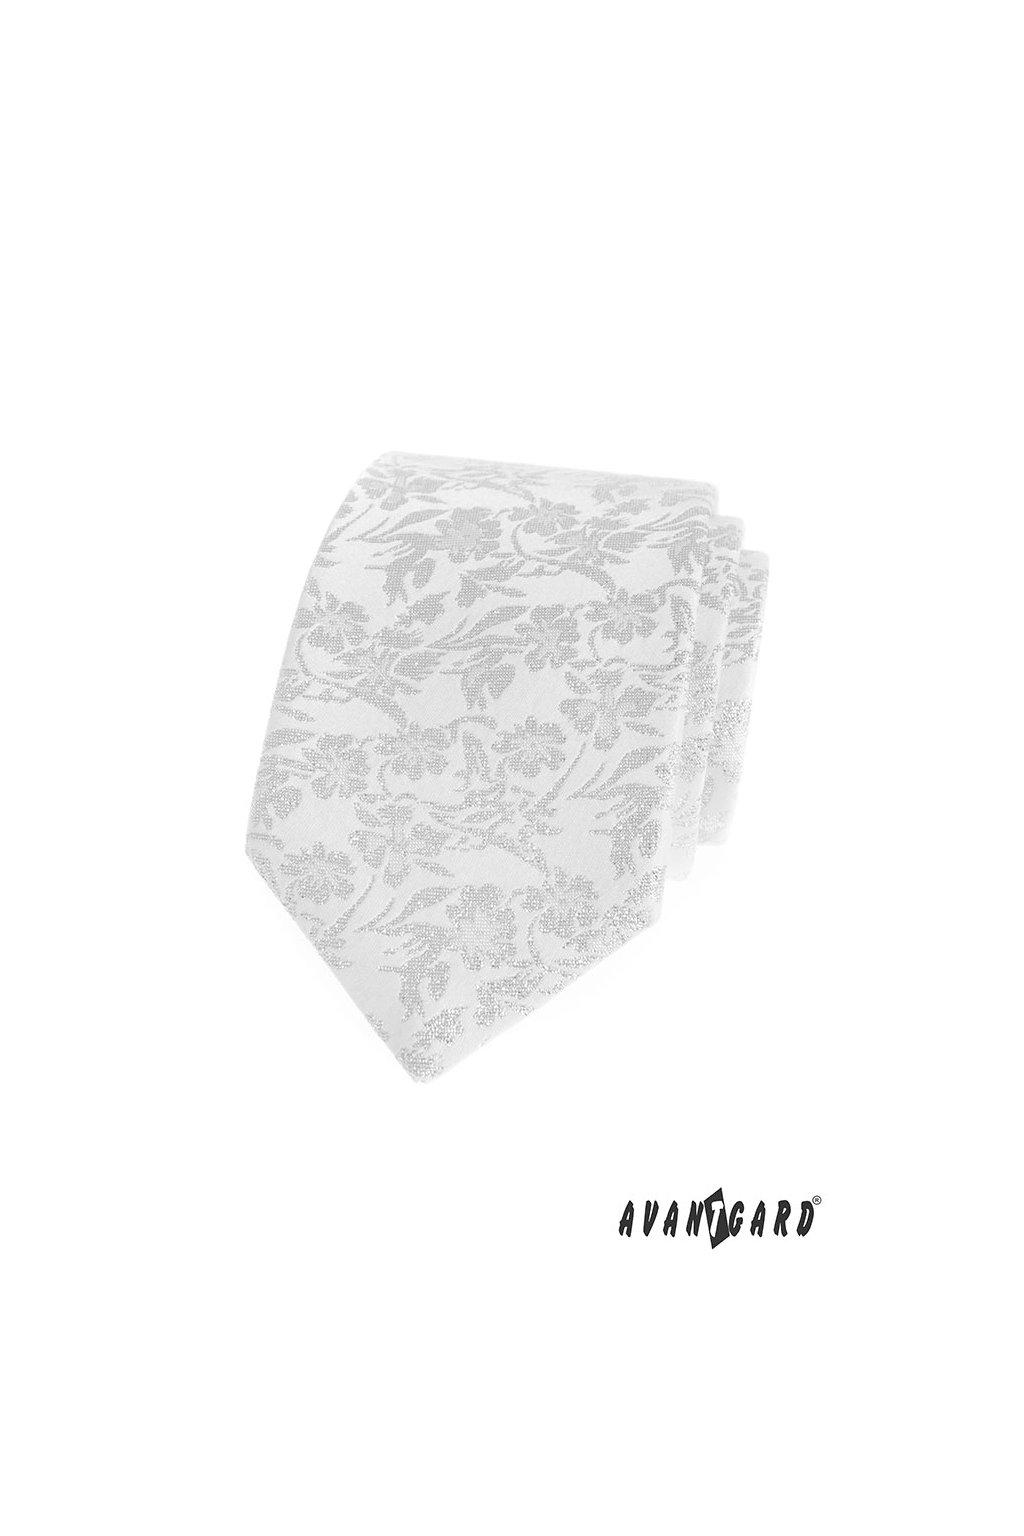 Bílá luxusní kravata s ornamentem 561 - 81184